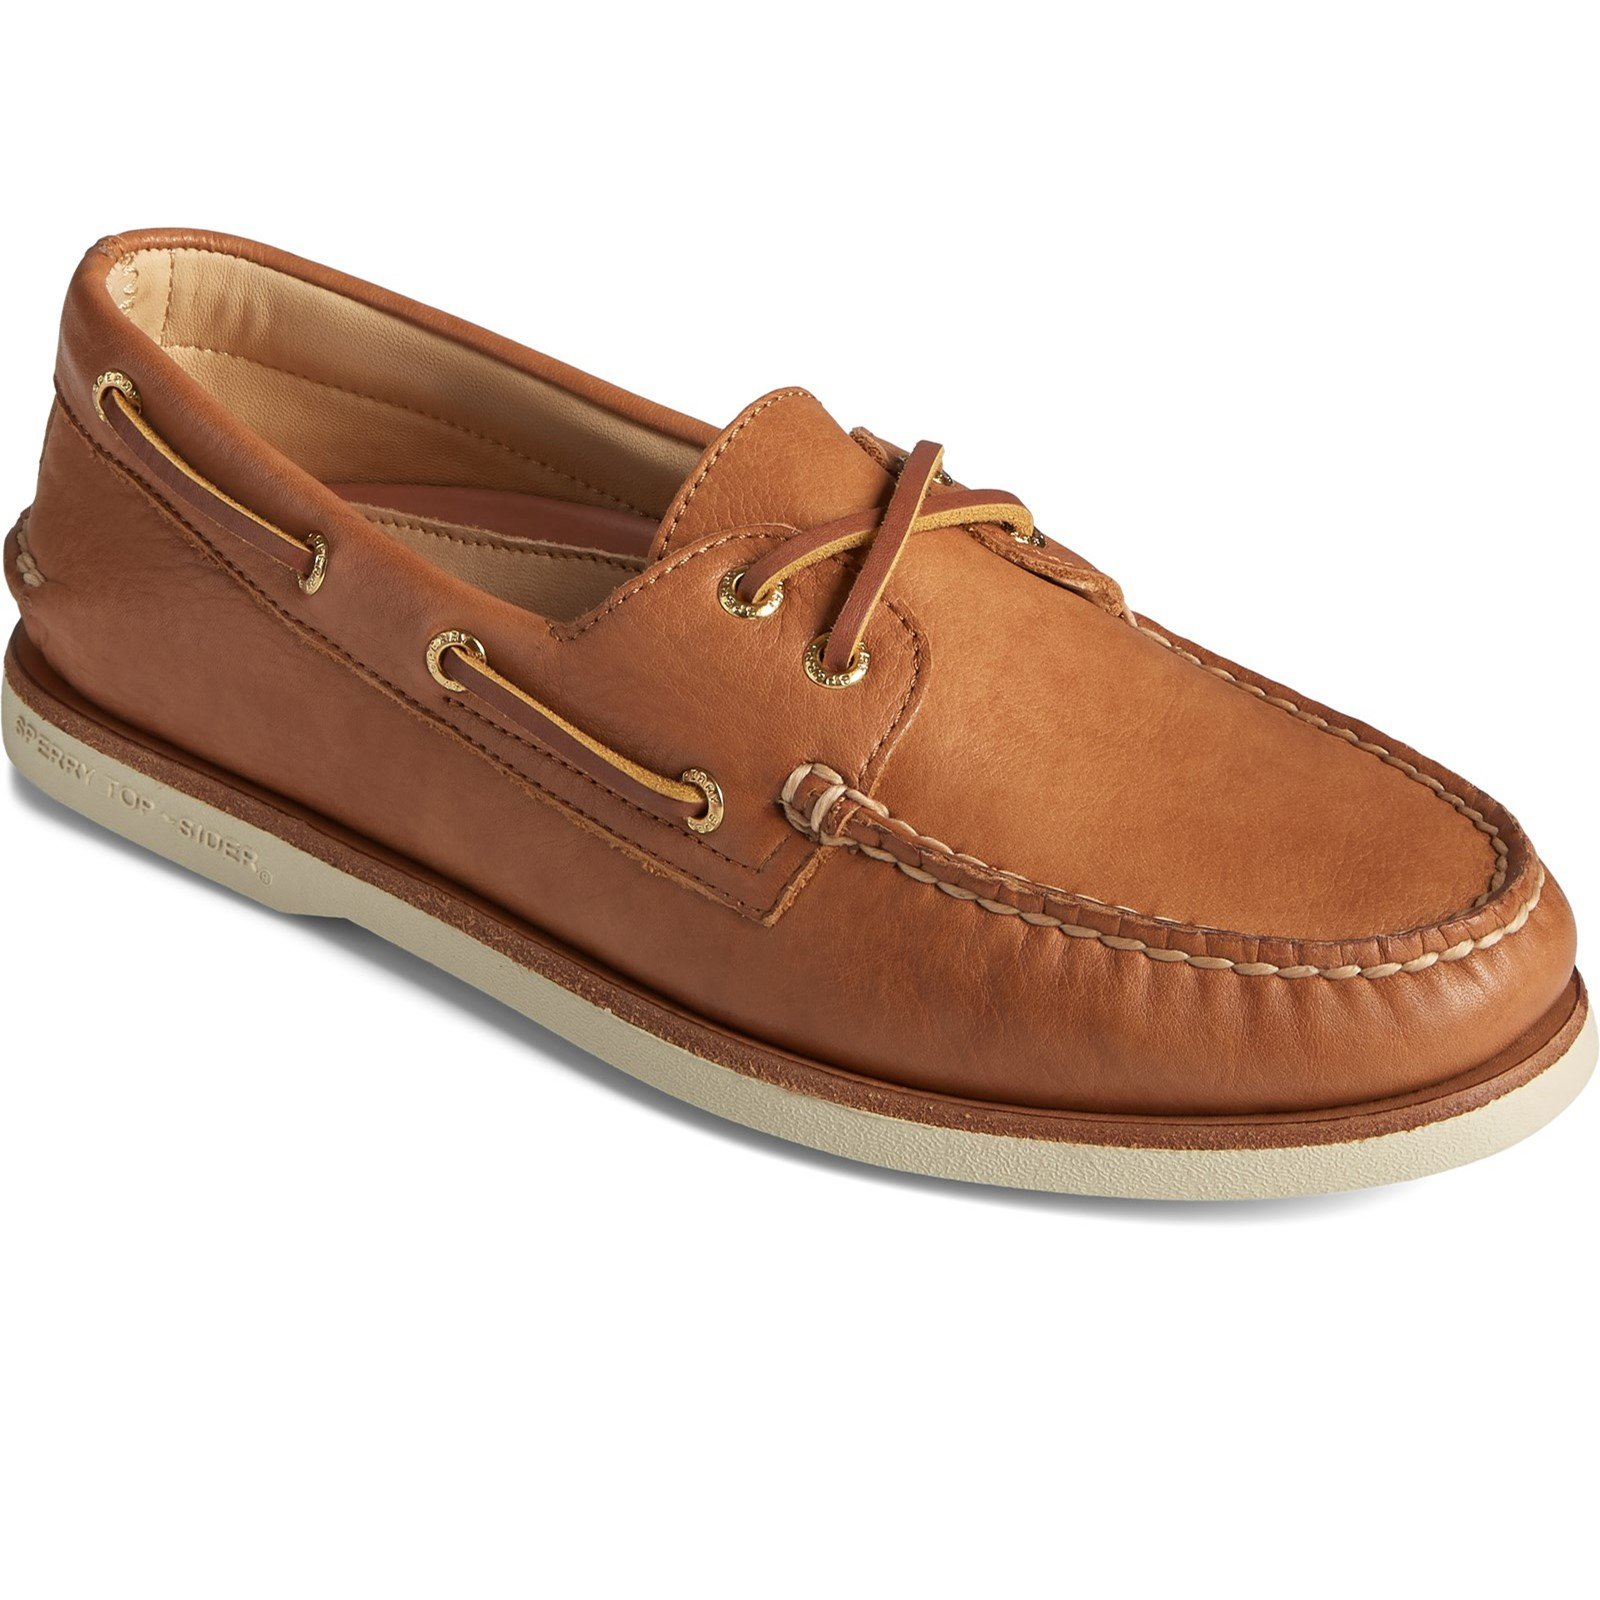 Sperry Men's A/O 2-Eye Boat Shoe Various Colours 32926 - Tan 7.5